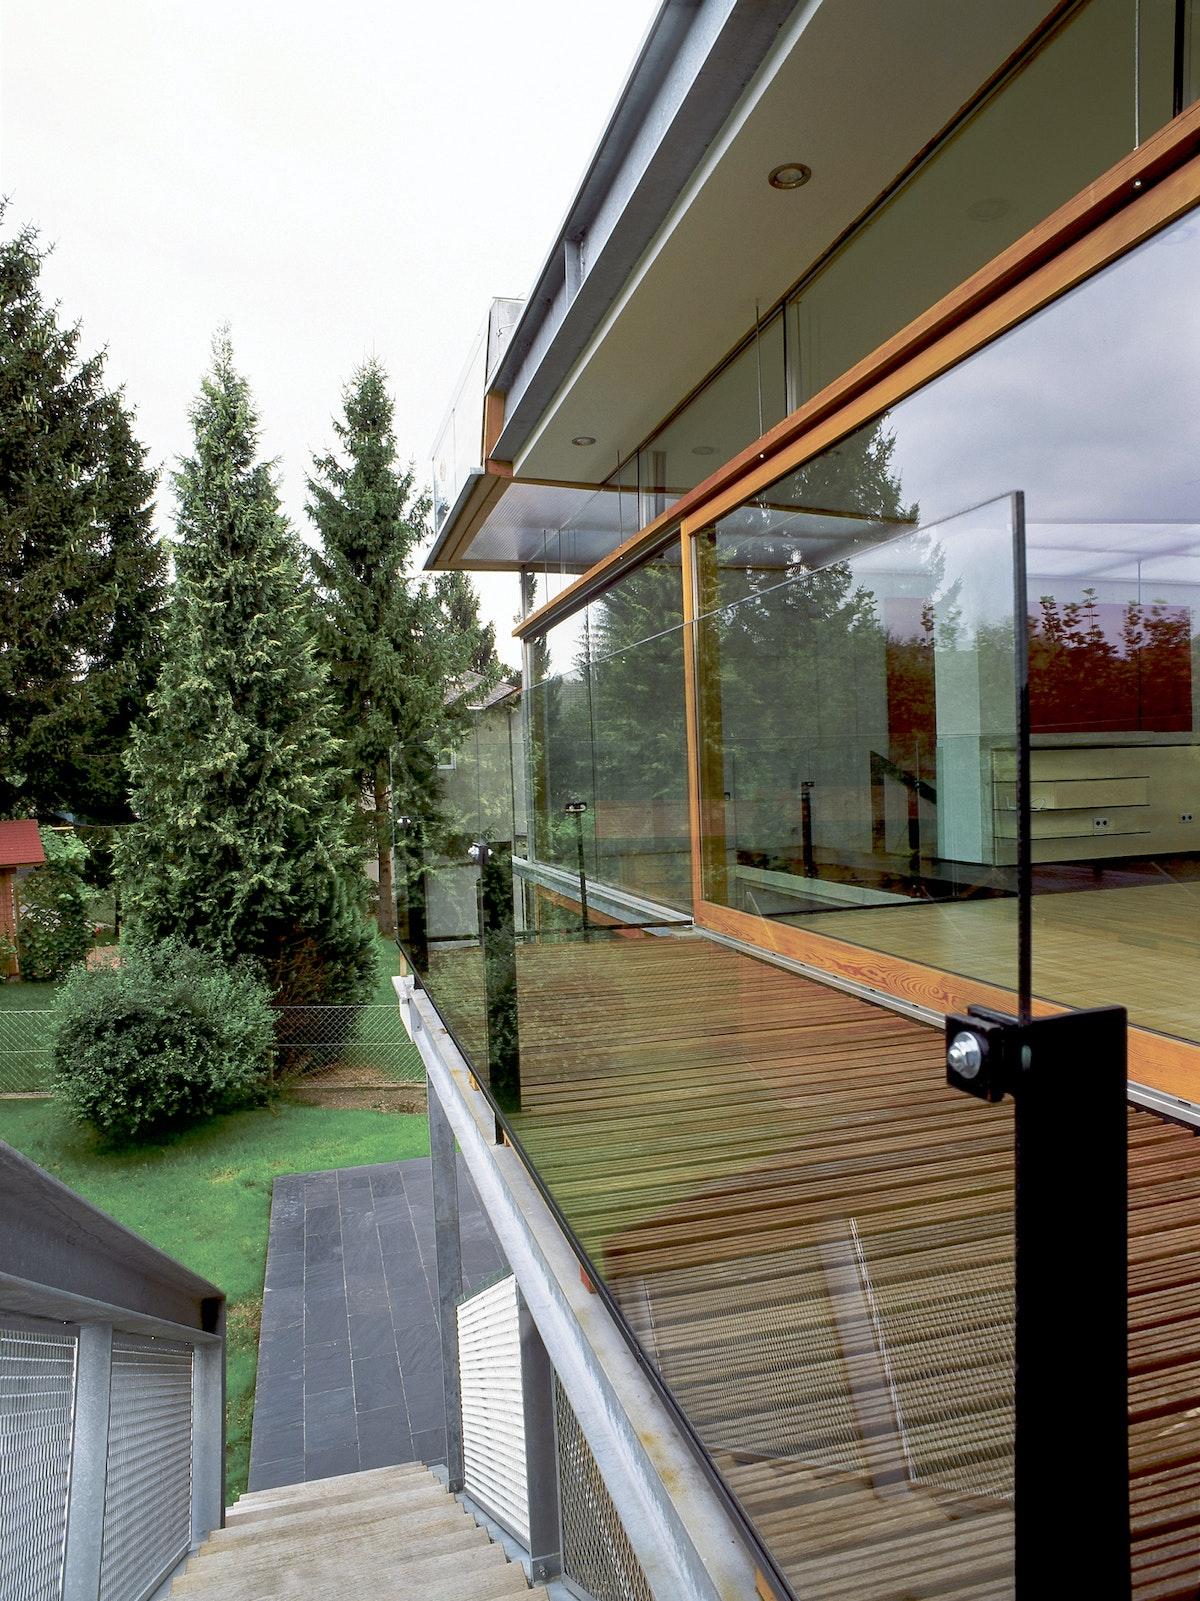 Solar Deck Lew Rodin 79020033